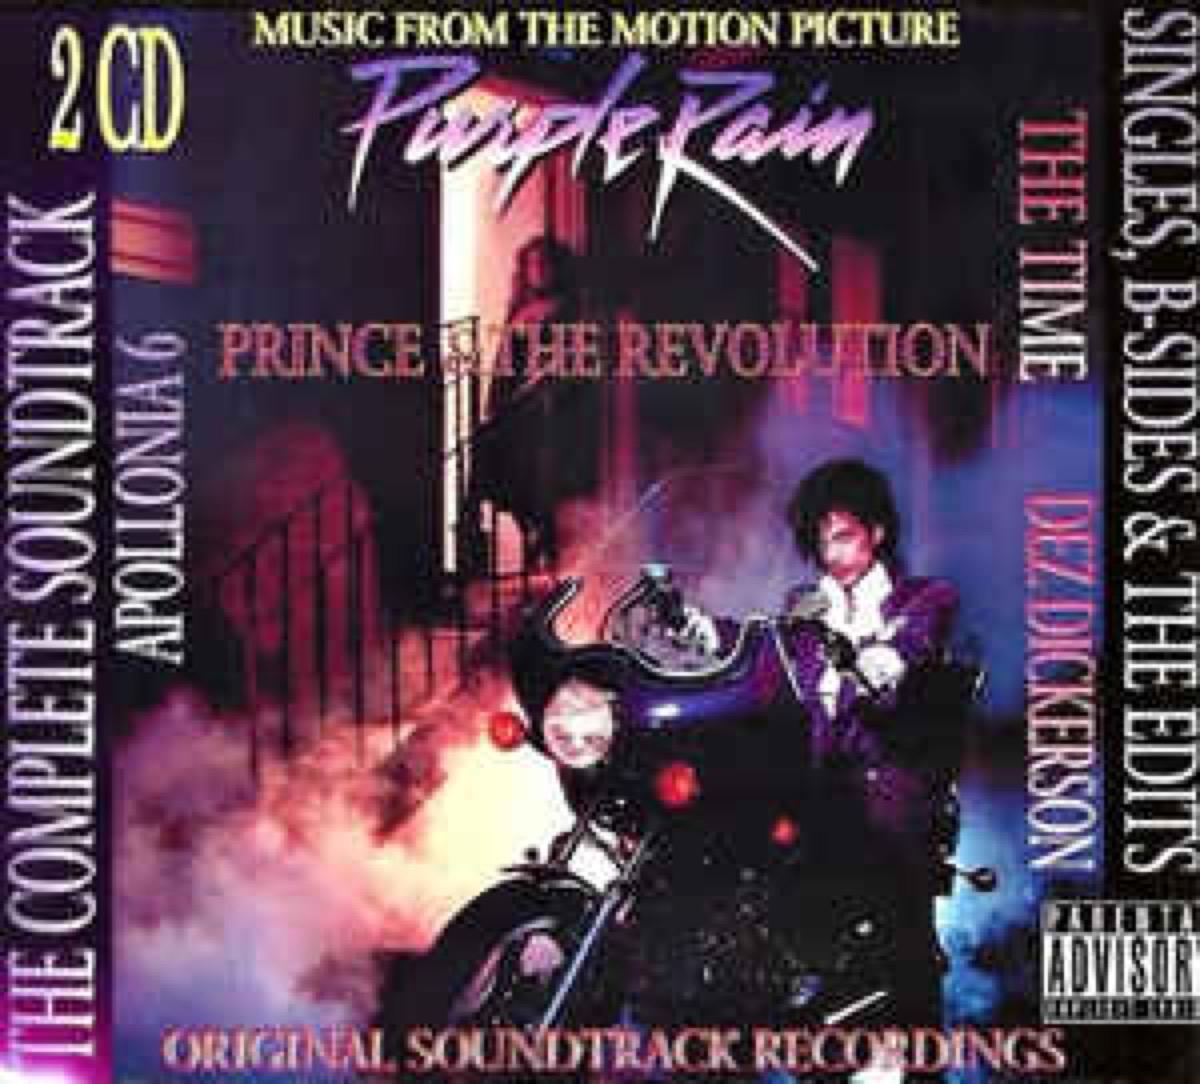 purple rain movie soundtrack album